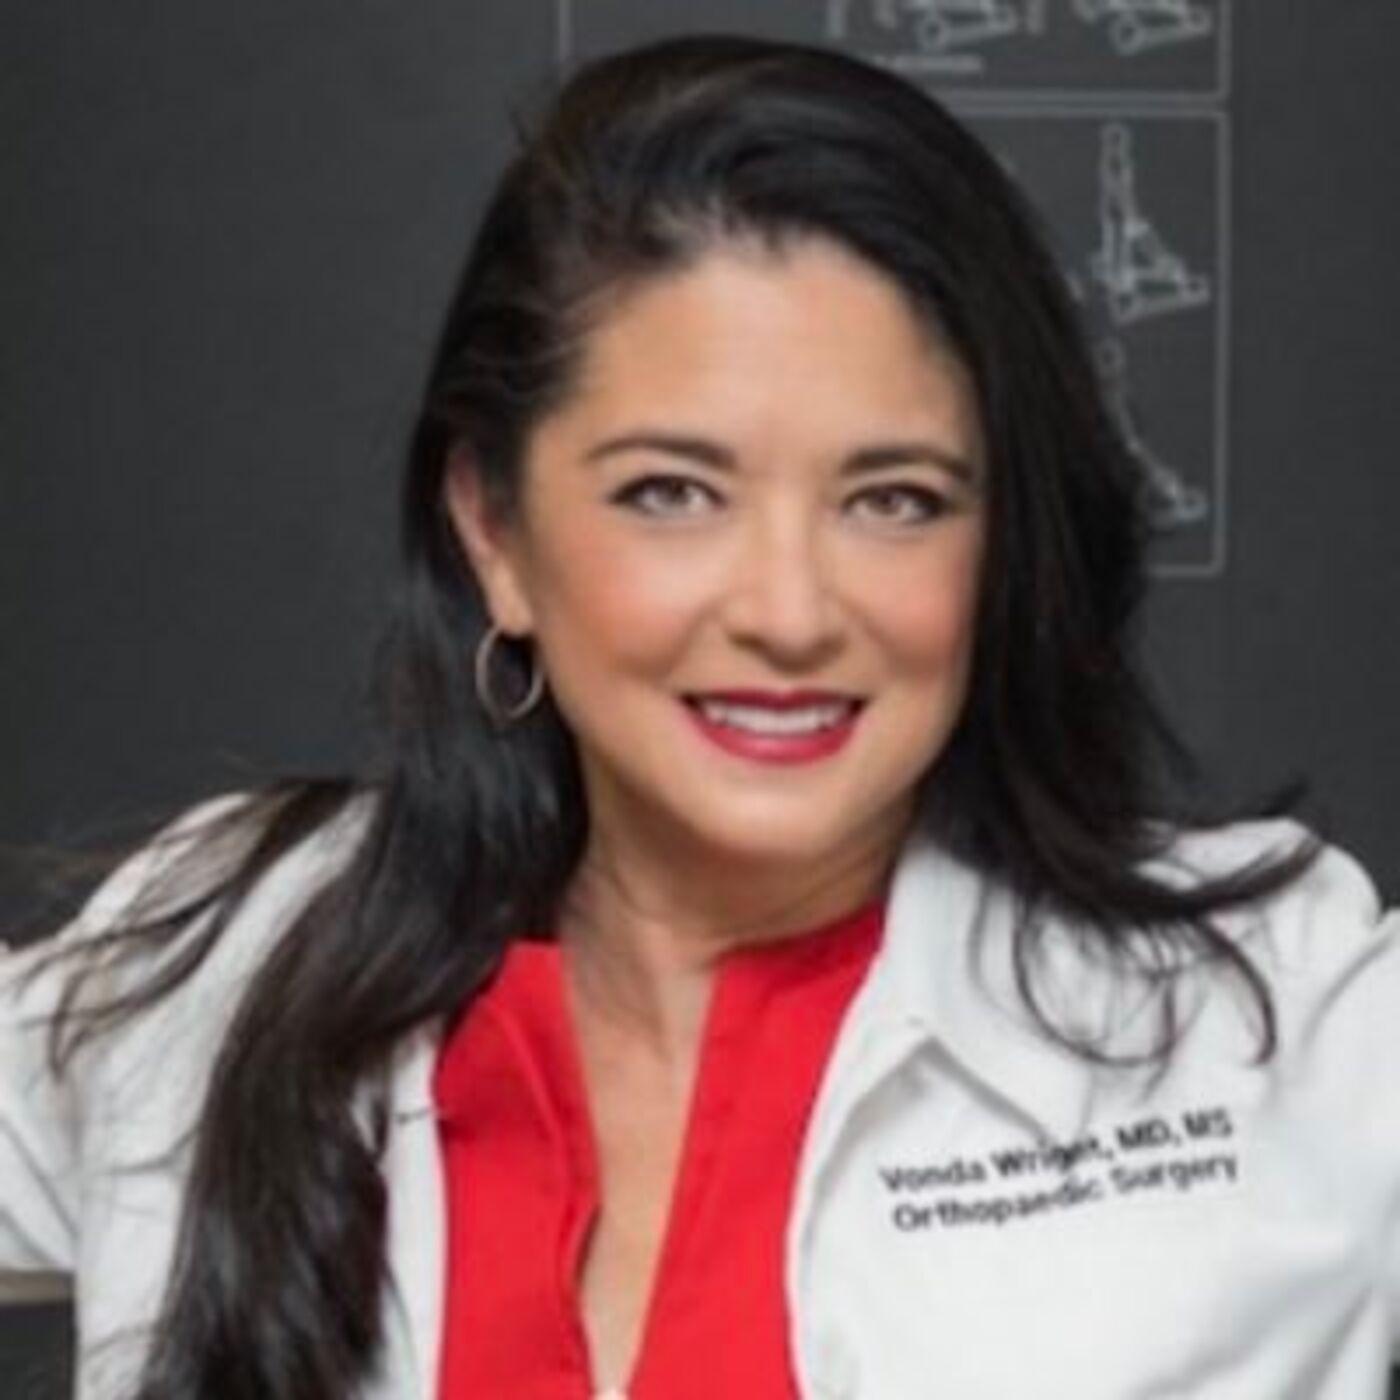 Medical Device Rep Podcast: Dr. Vonda Wright